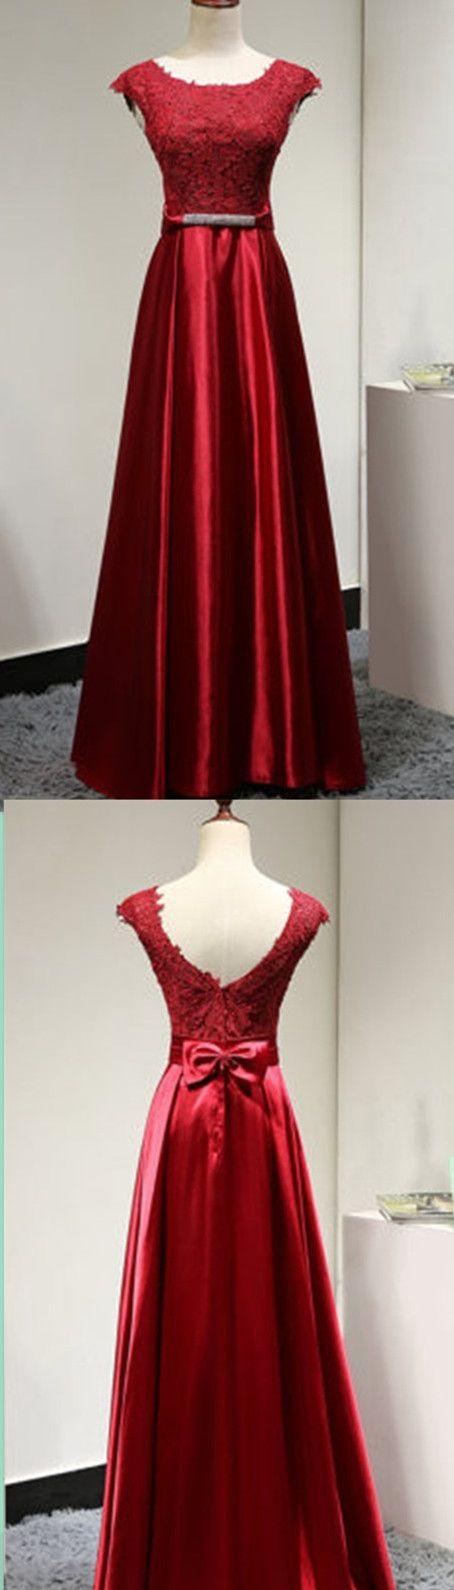 Burgundy Satin prom dress, sexy prom dress,Charming prom dress, long prom dress,prom dresses, elegant prom dress, prom dress